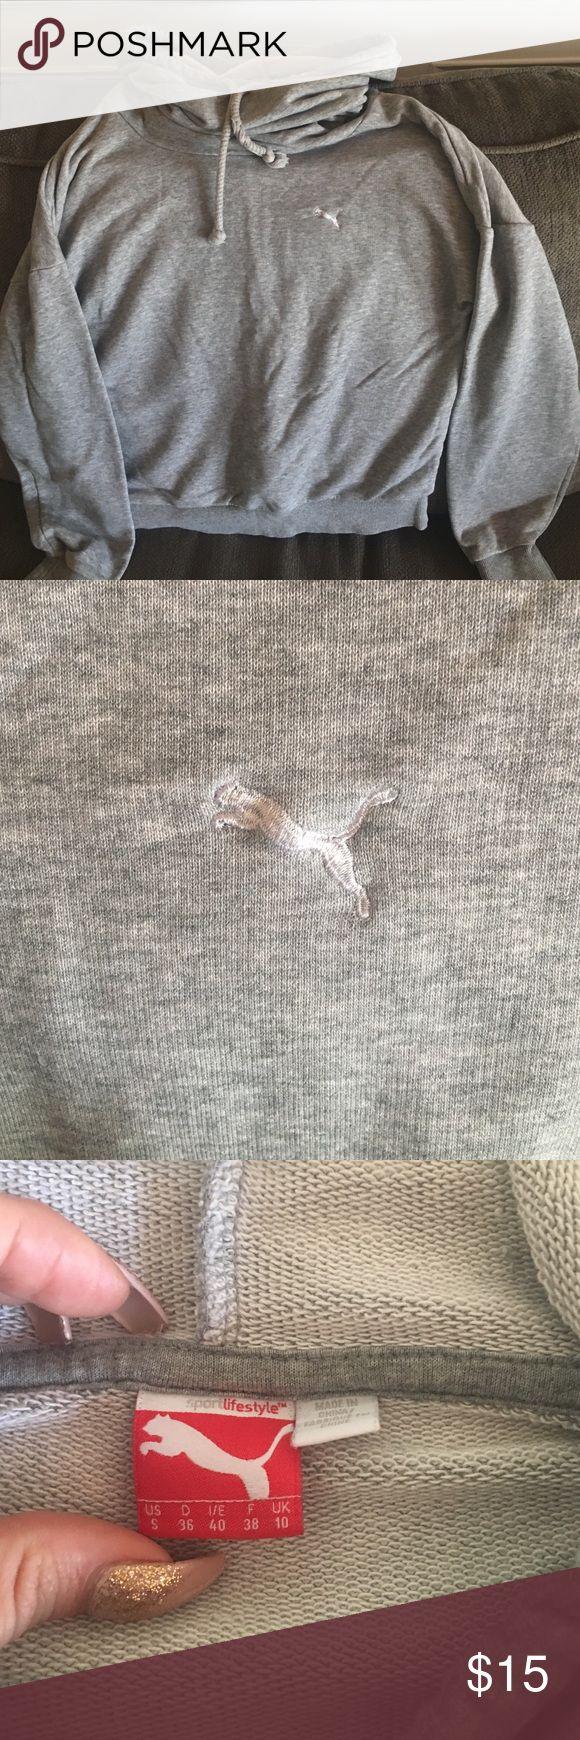 Puma sweatshirt Cozy puma sweatshirt. Slouchy hood with draw strings. Strings show light wear but over all condition is fantastic! Puma Tops Sweatshirts & Hoodies